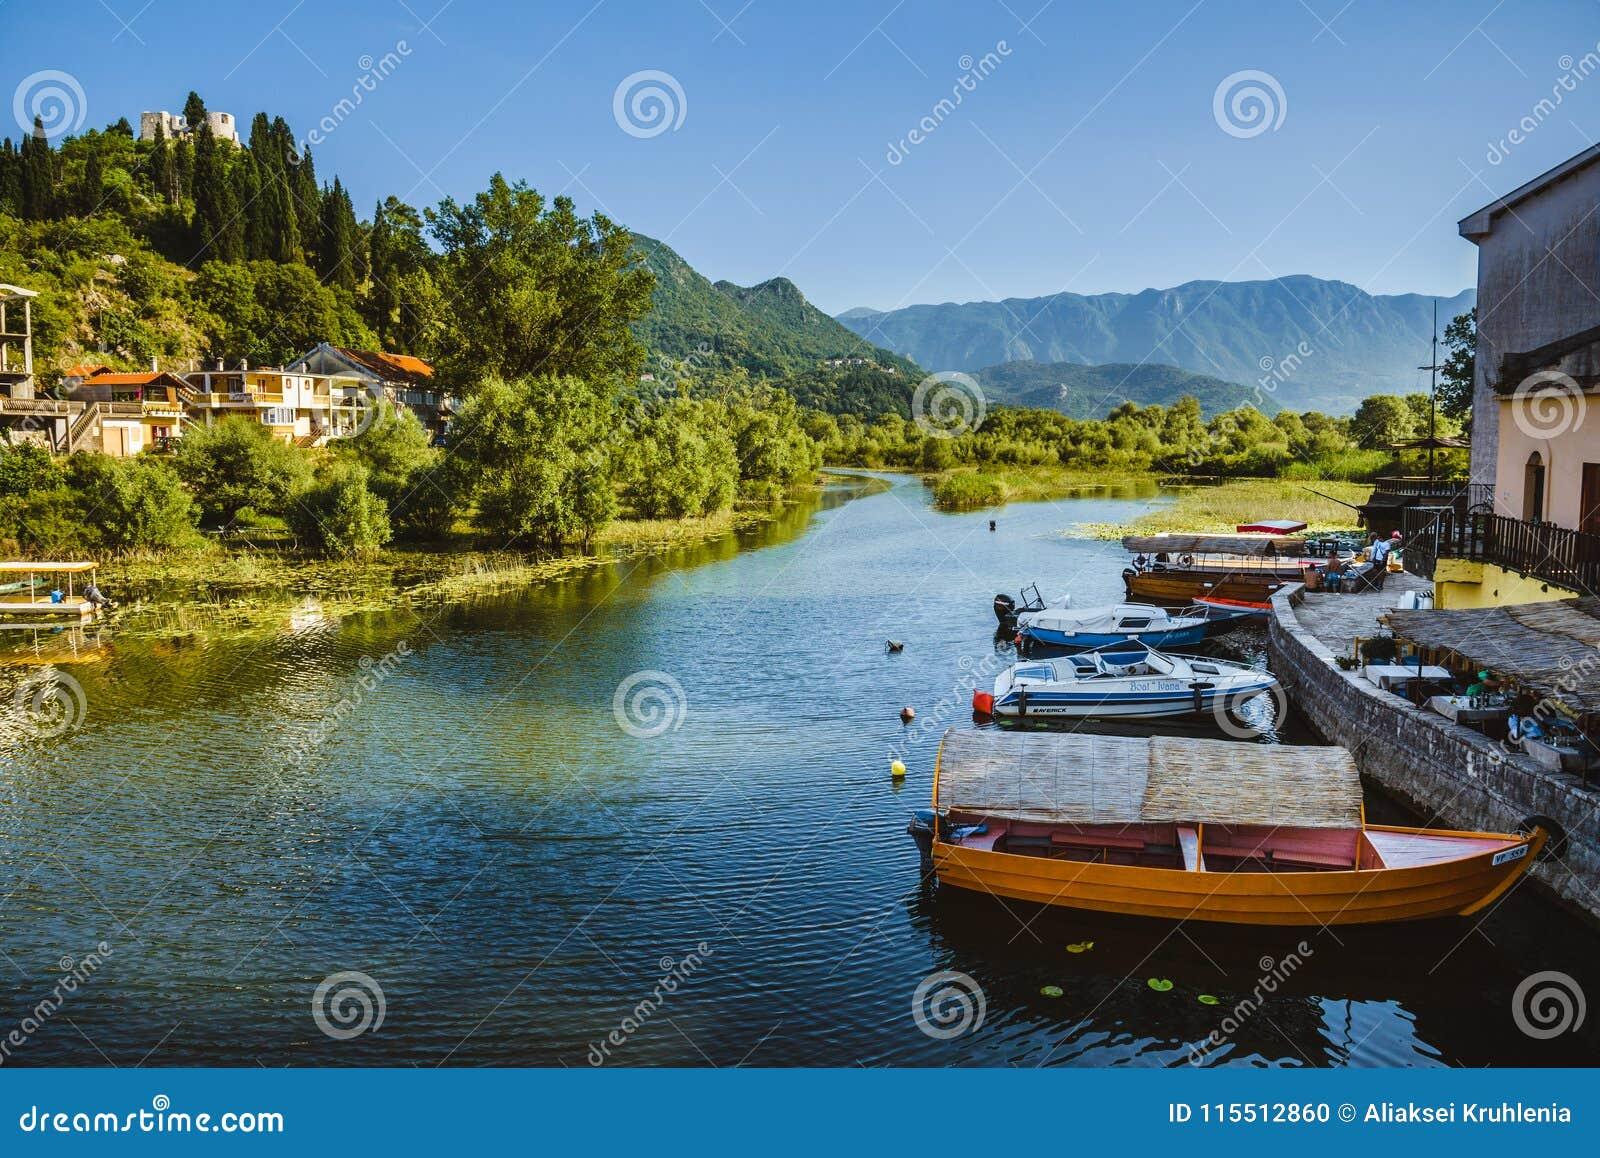 Barcos de pesca no lago Skadarsko, Montenegro